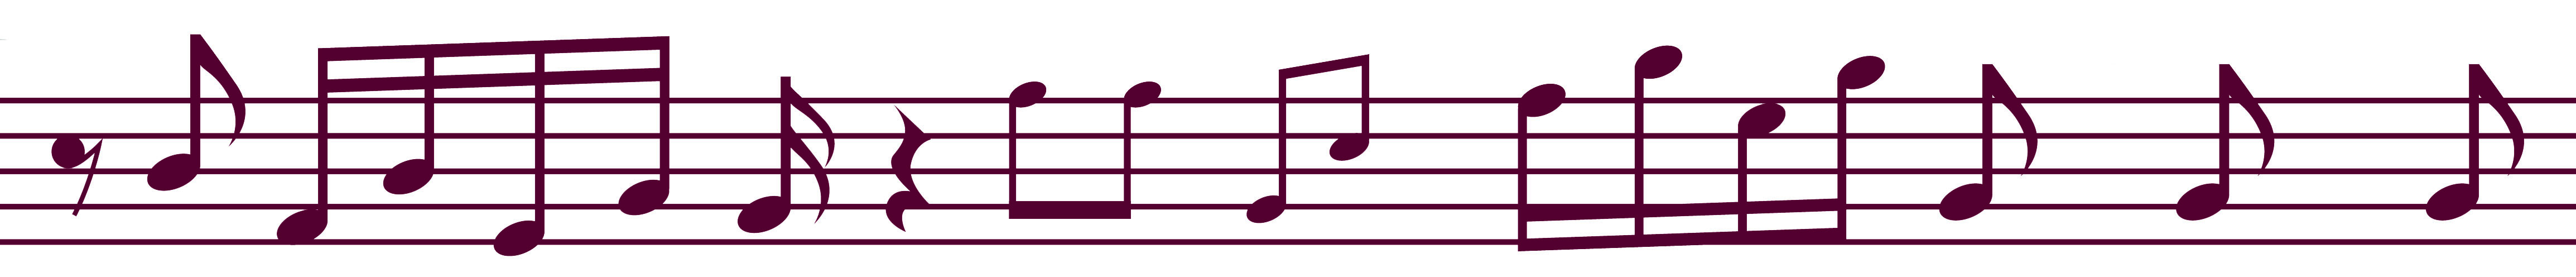 Music Bar JPG